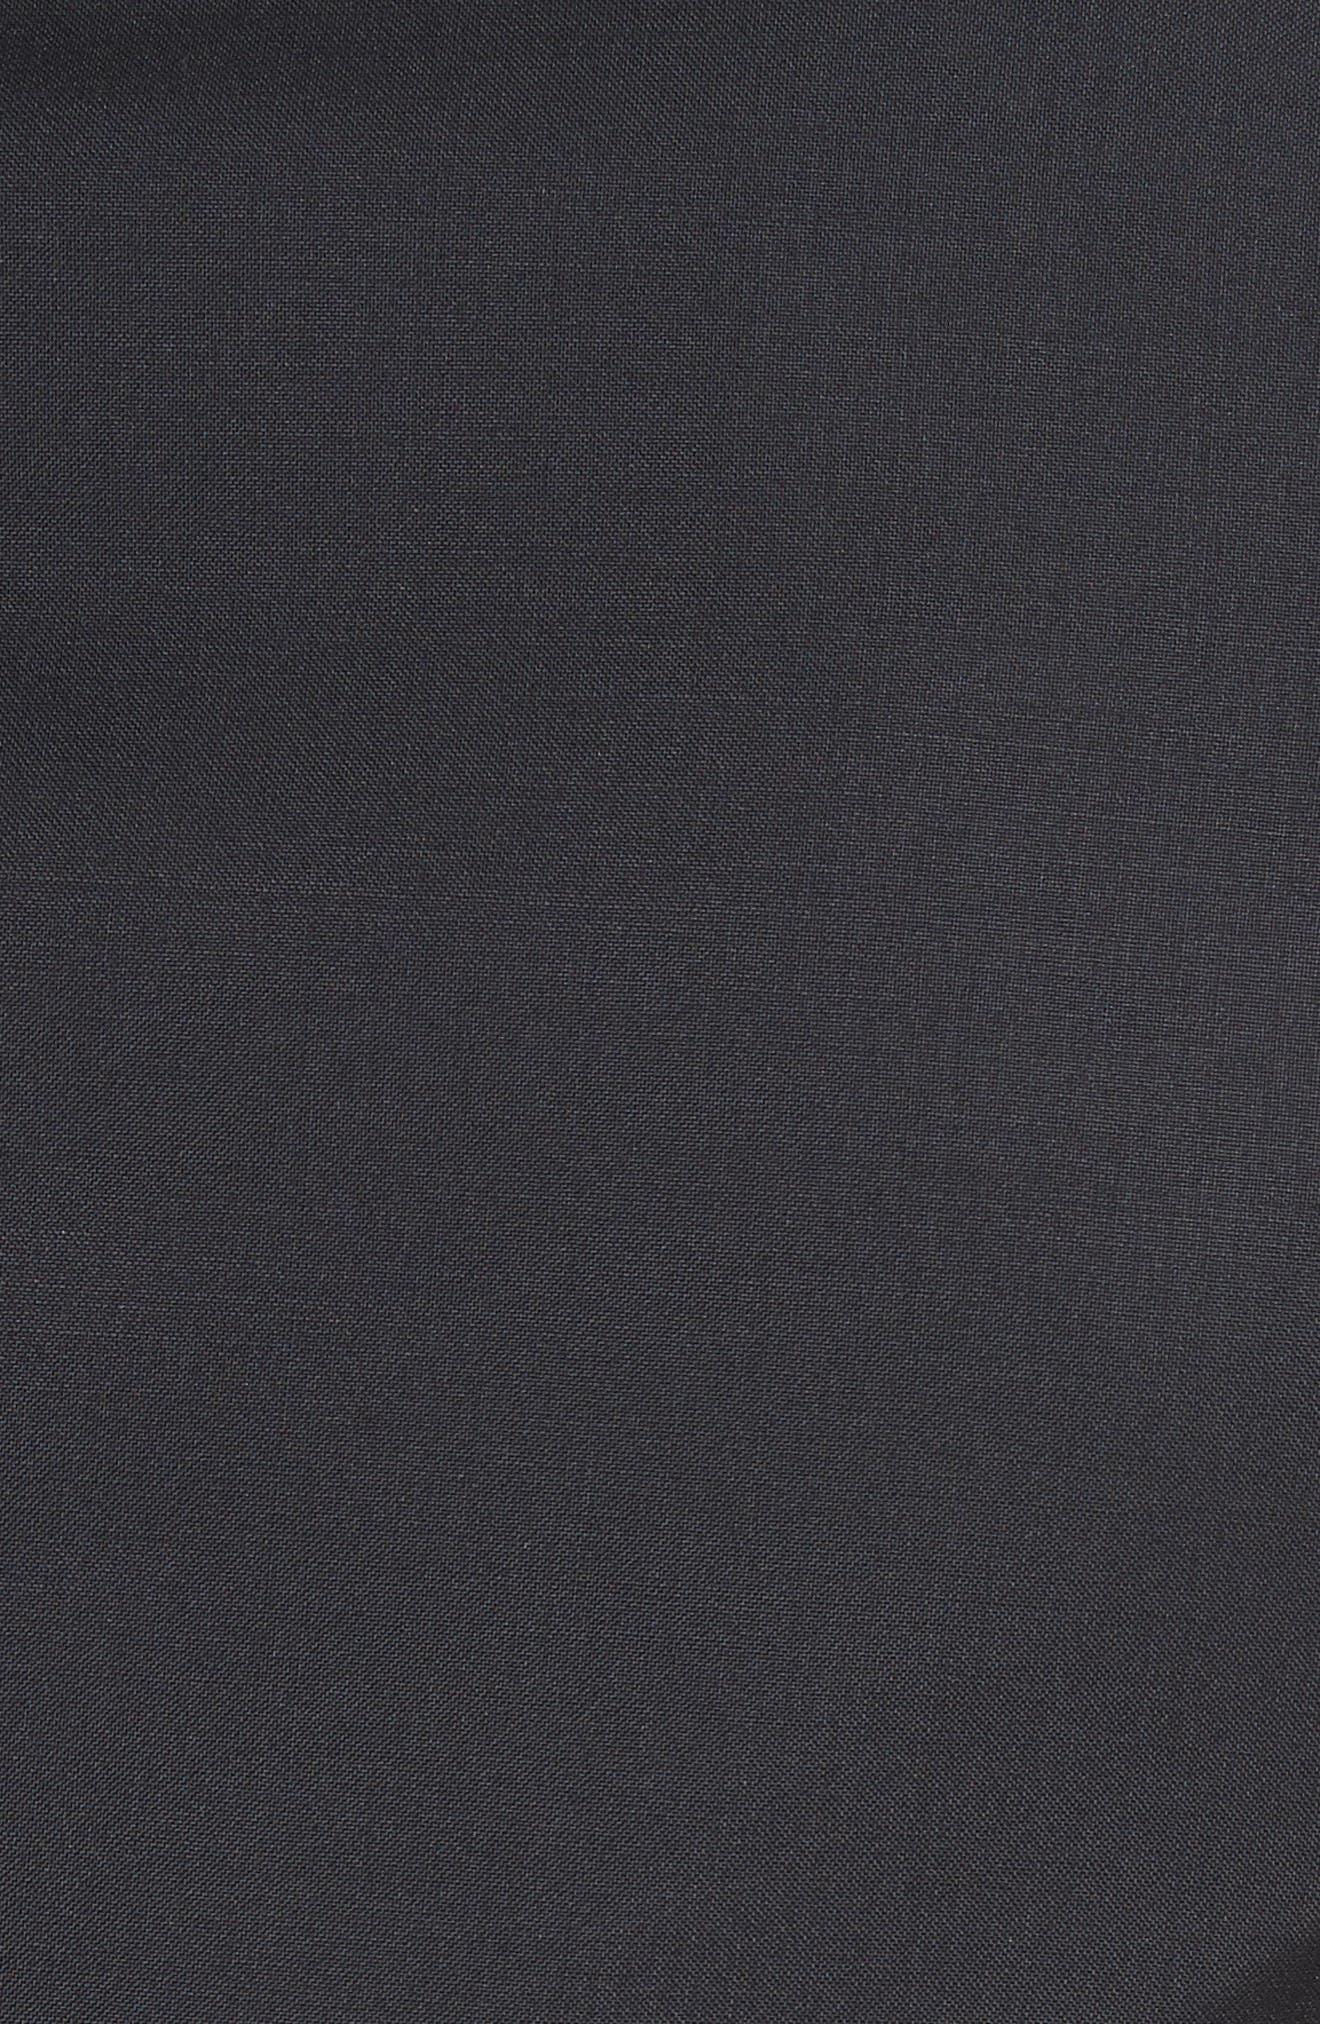 Peak Lapel Wool Blend Tuxedo,                             Alternate thumbnail 7, color,                             Navy